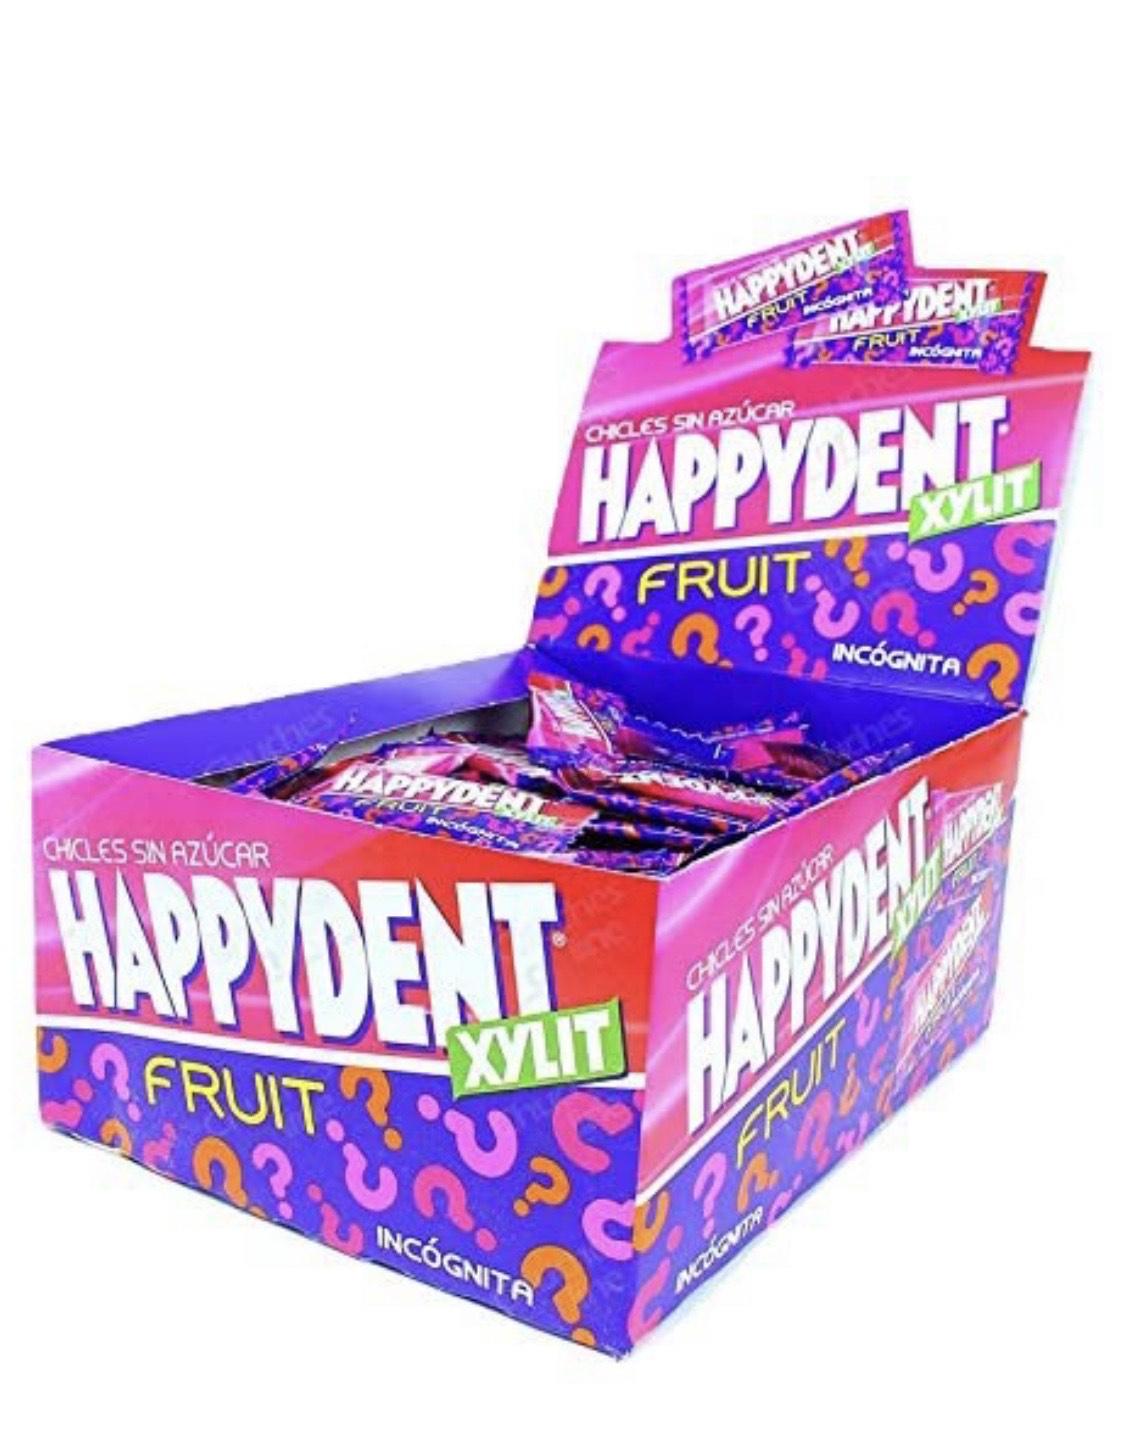 200 chicles Happydent - Primaprix